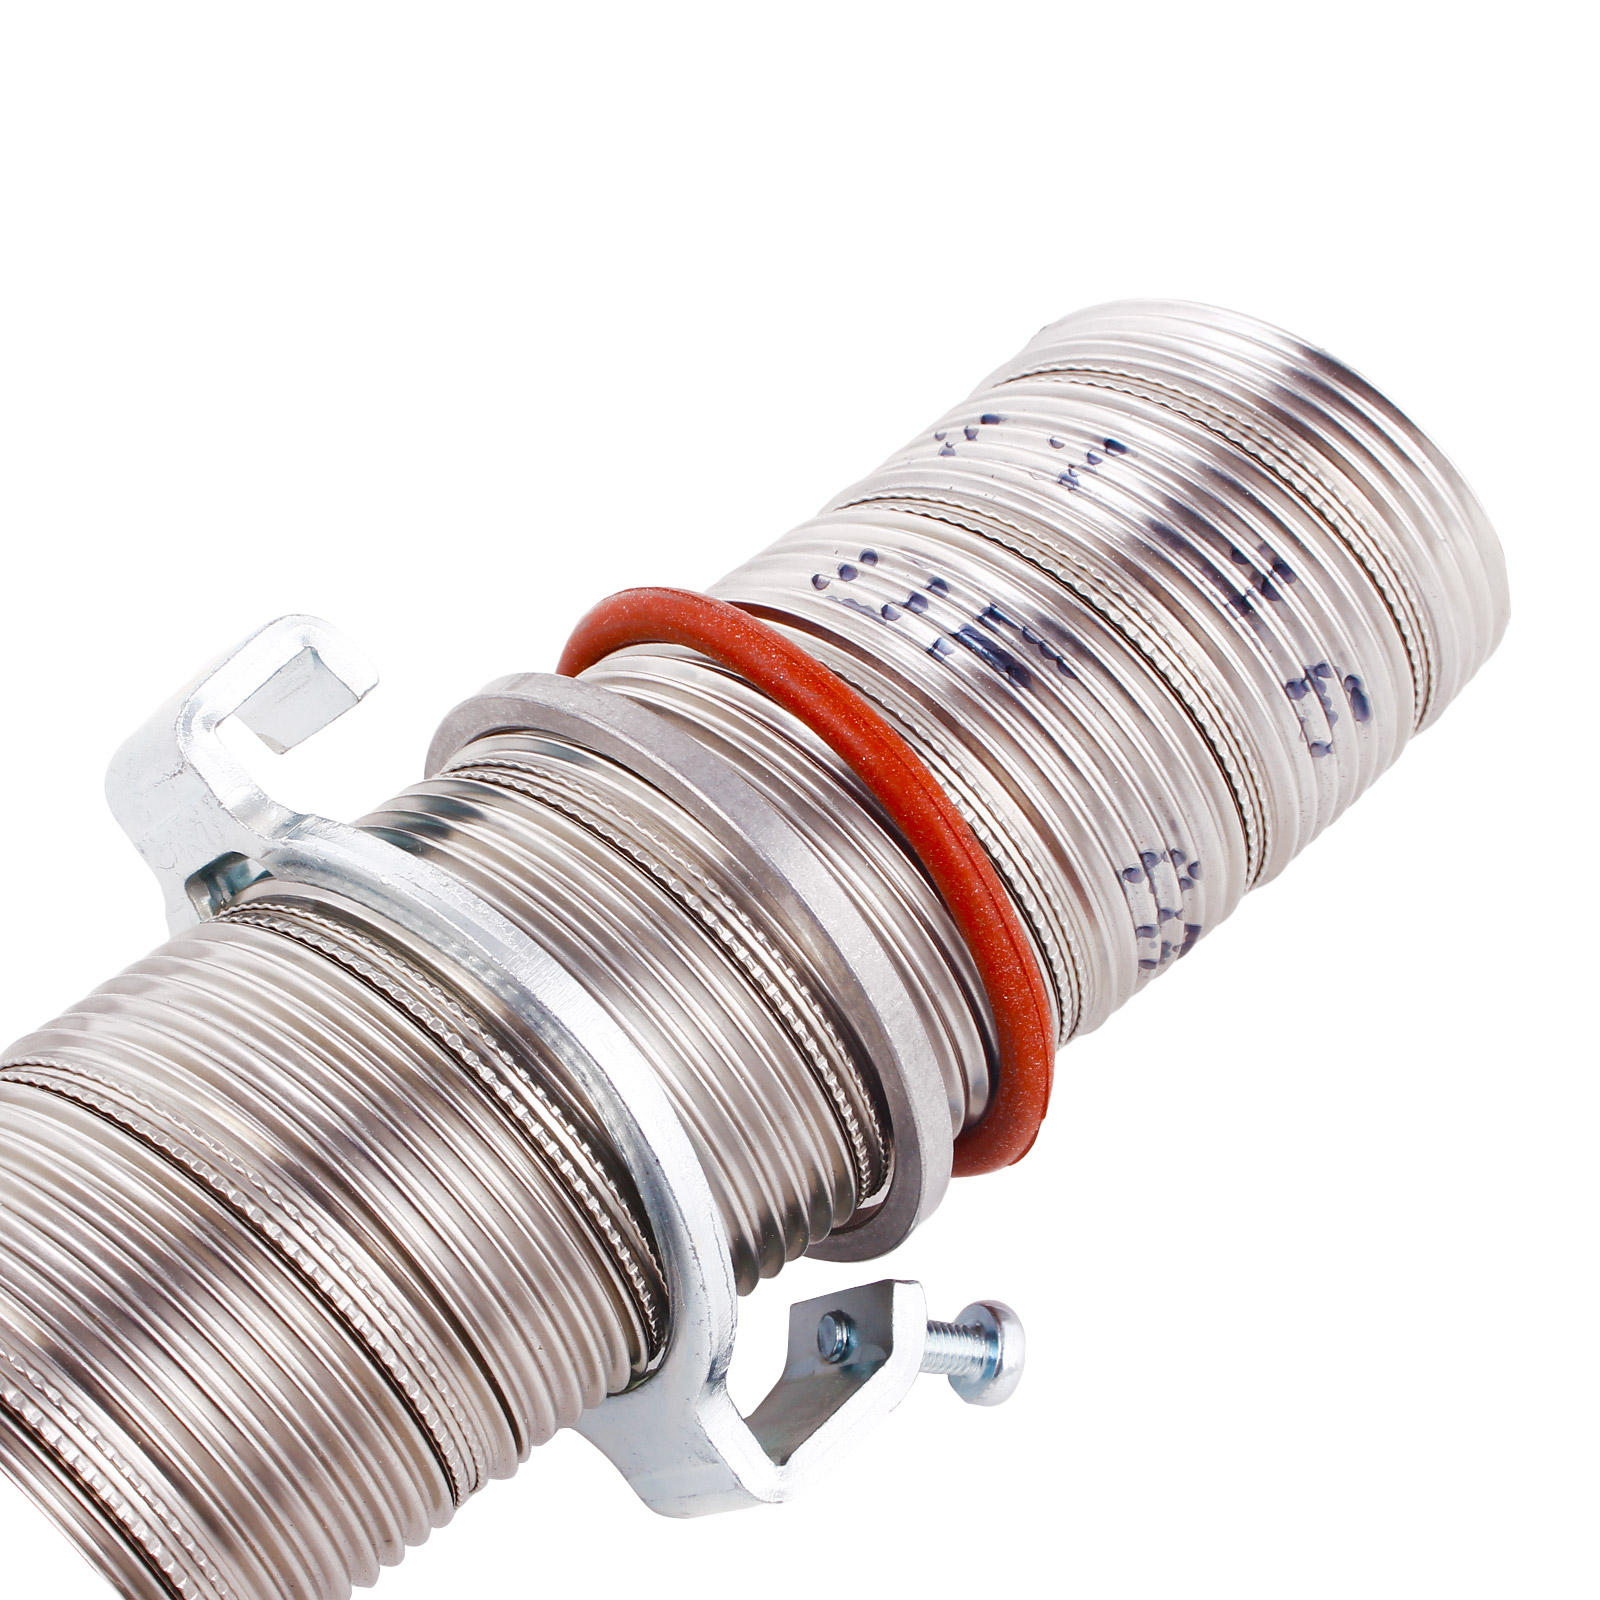 Truma Abgasrohrbefestigung Dichtung passend für Trumatic S 5002, S 5004